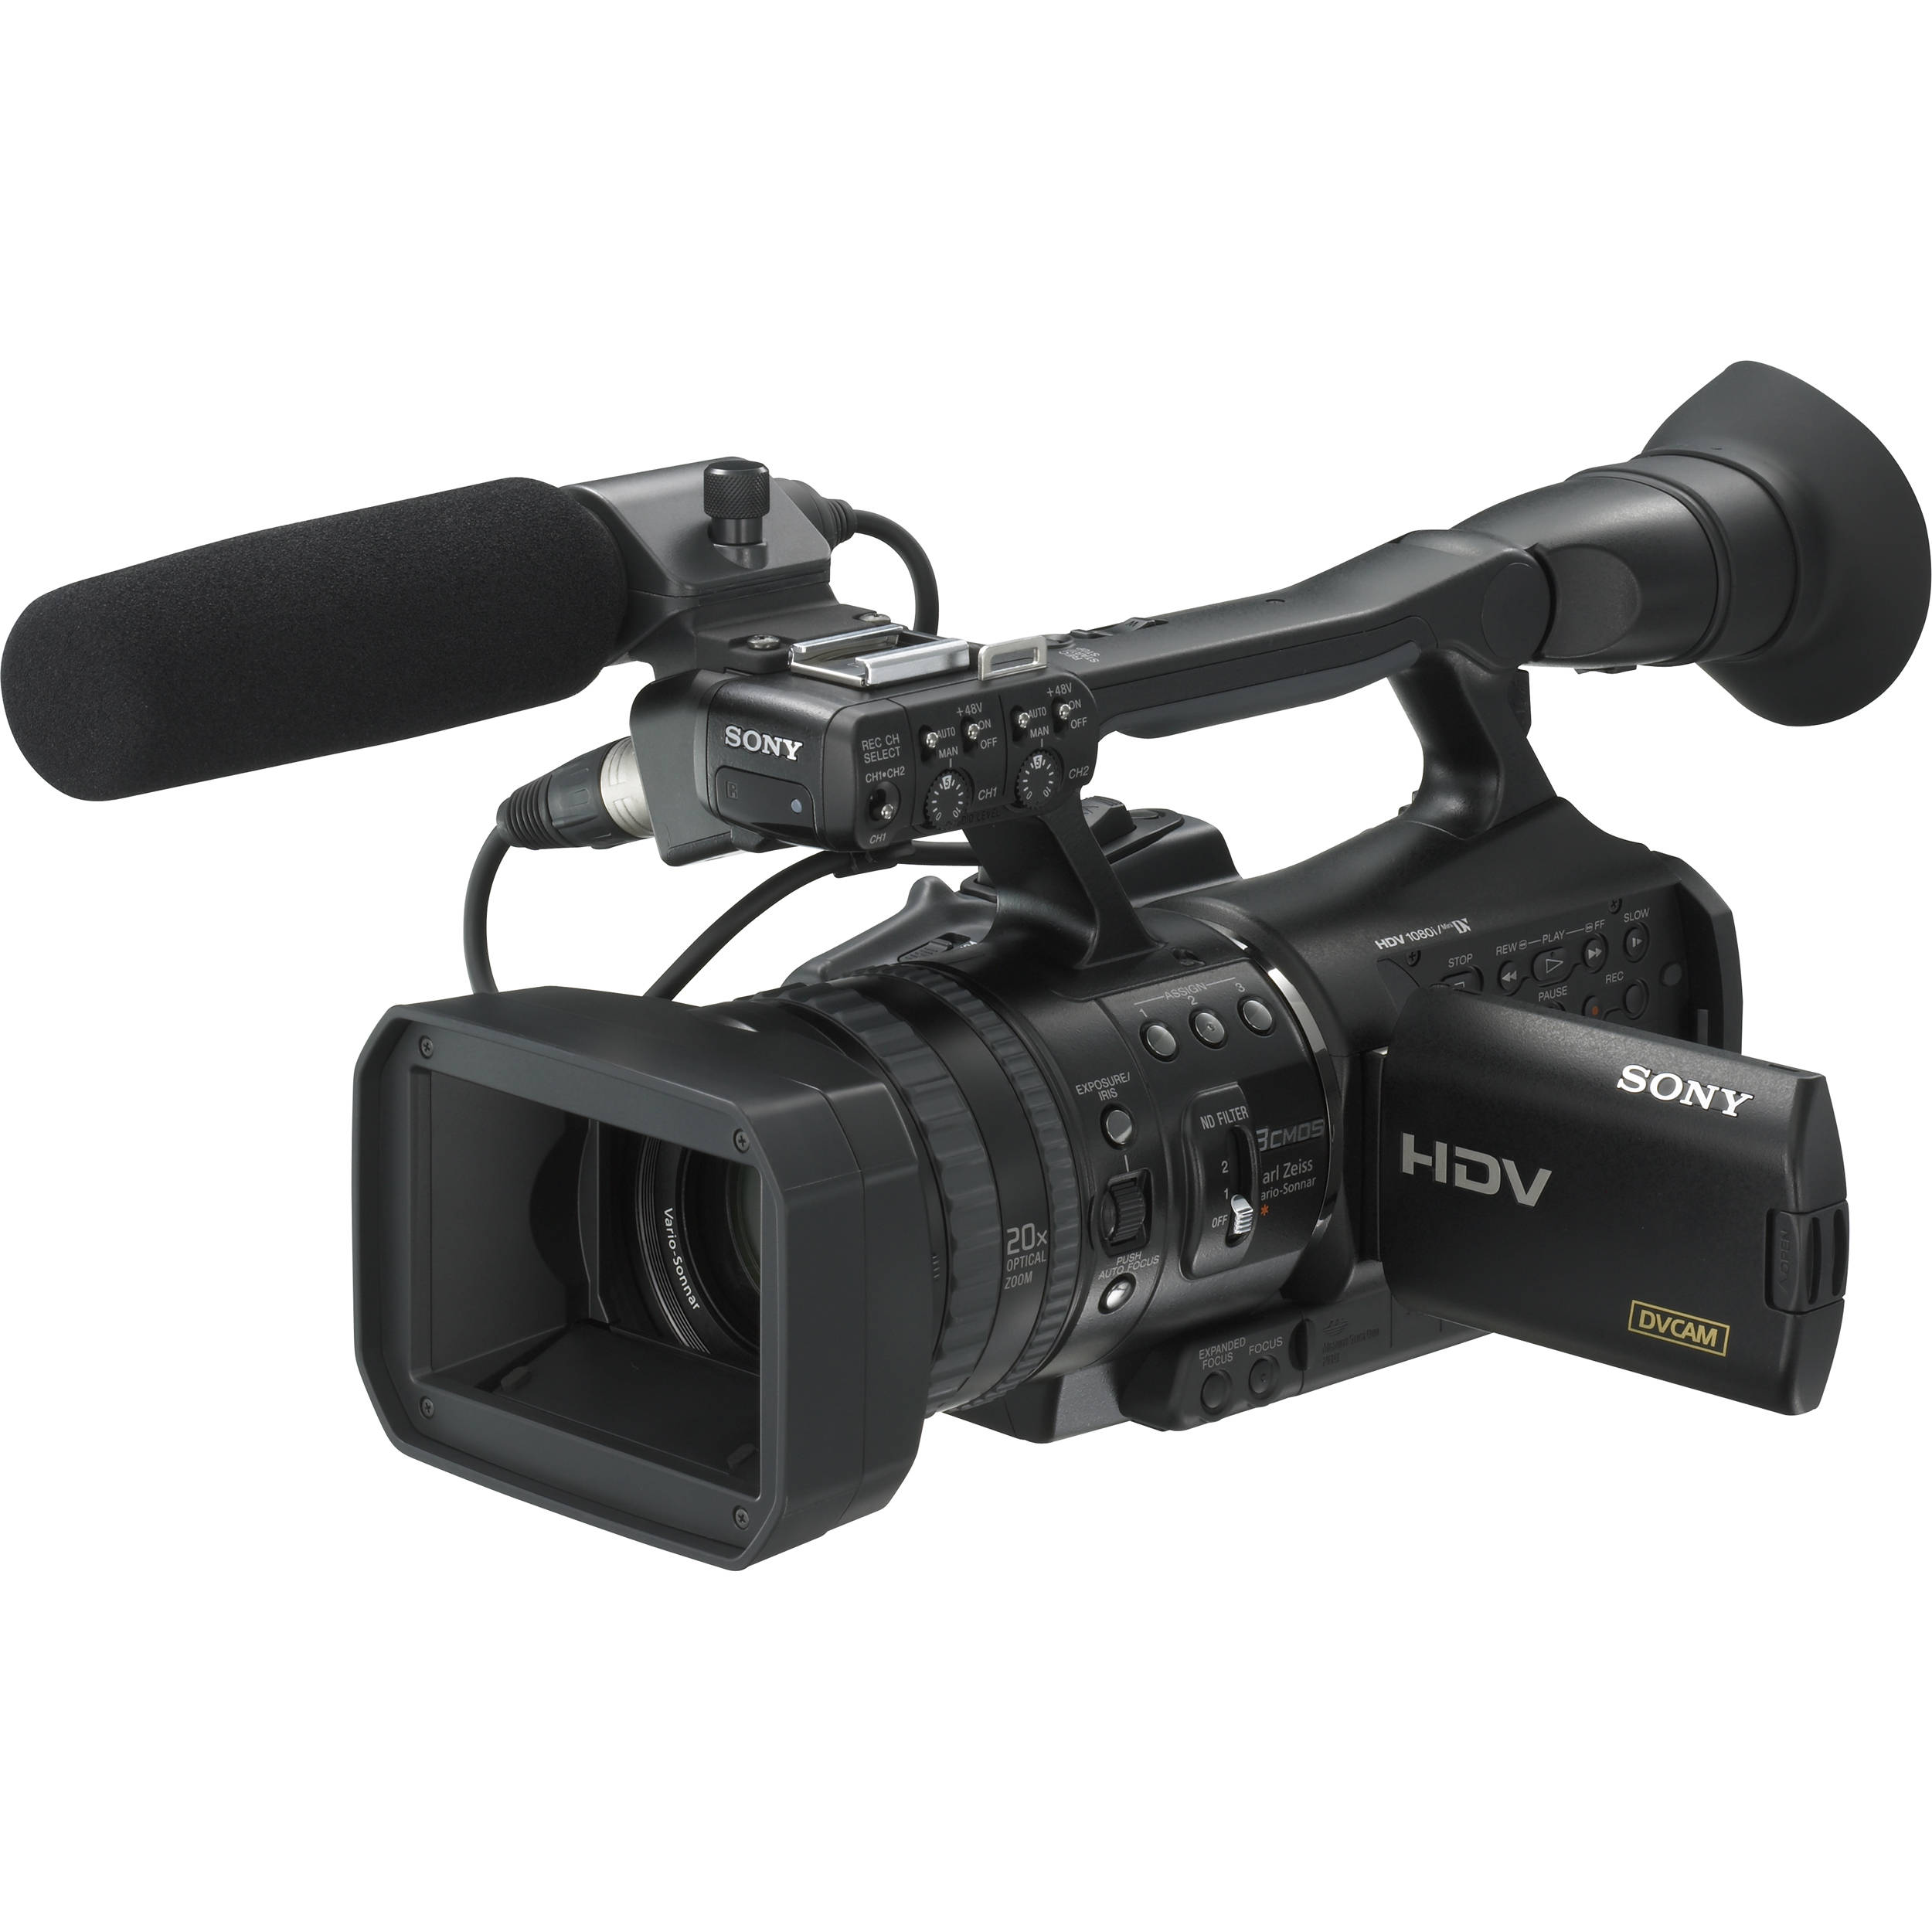 sony hvr v1u hdv camcorder hvrv1u b h photo video rh bhphotovideo com sony hvr-v1u manual pdf sony v1u manual